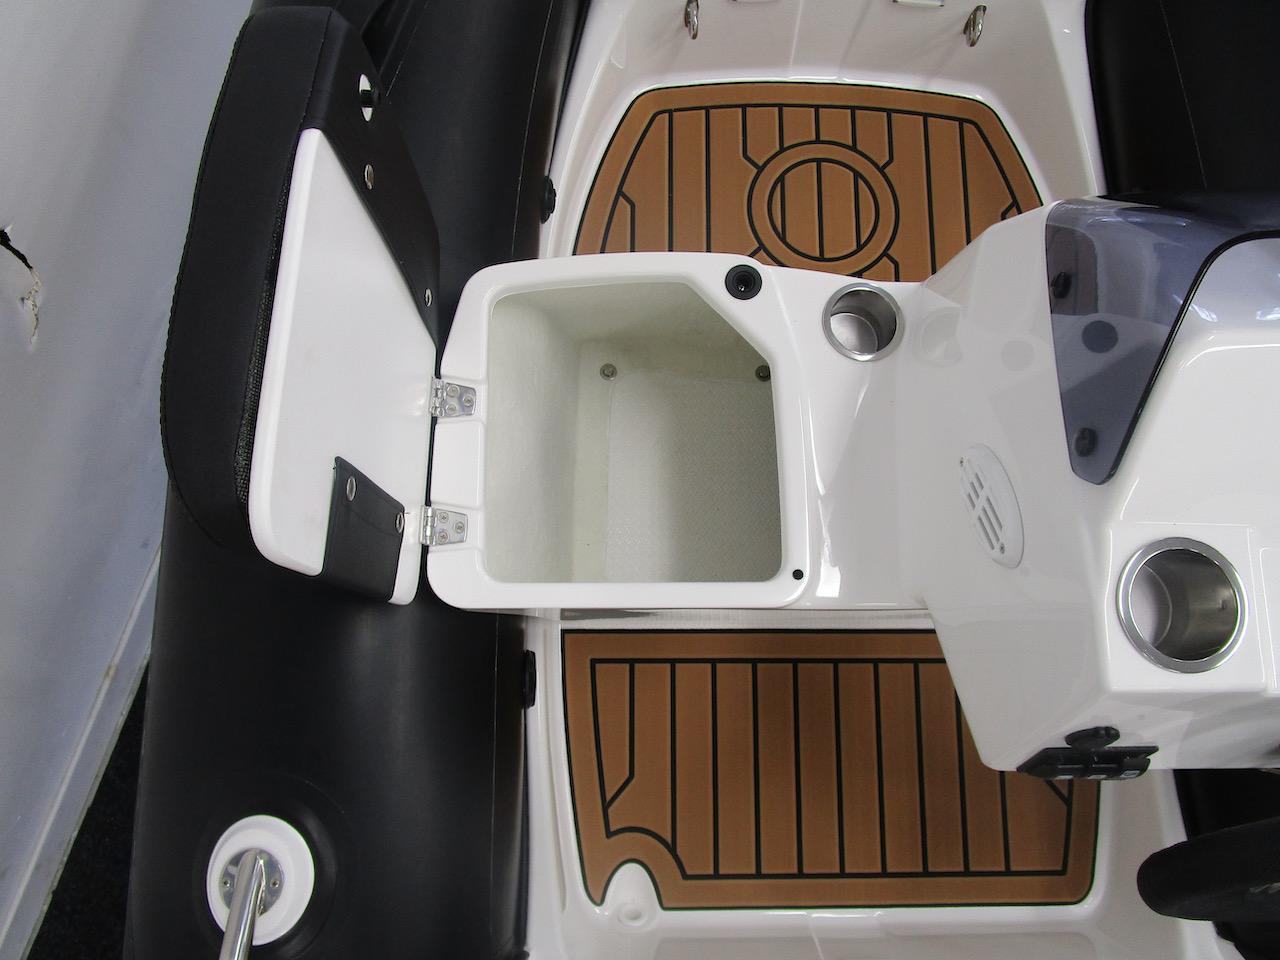 G340N interior floor and side seat storage